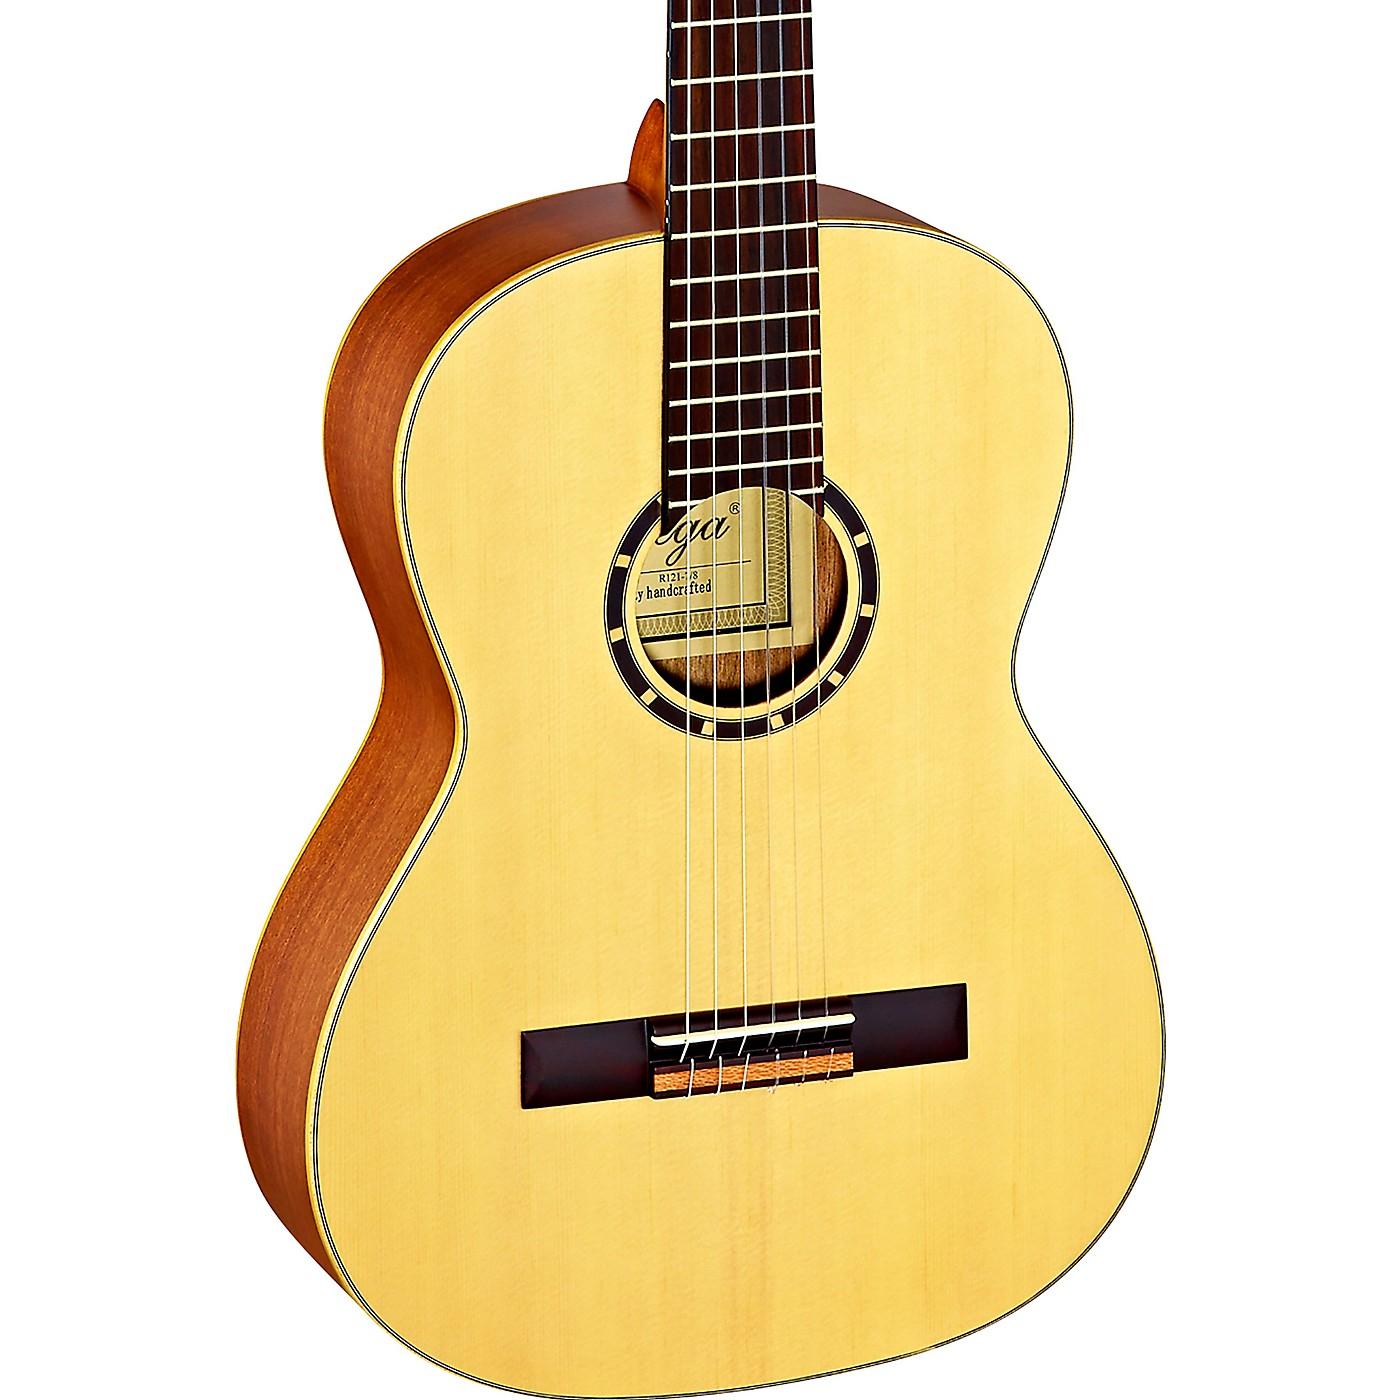 Ortega Family Series R121-7/8 7/8 Size Classical Guitar thumbnail